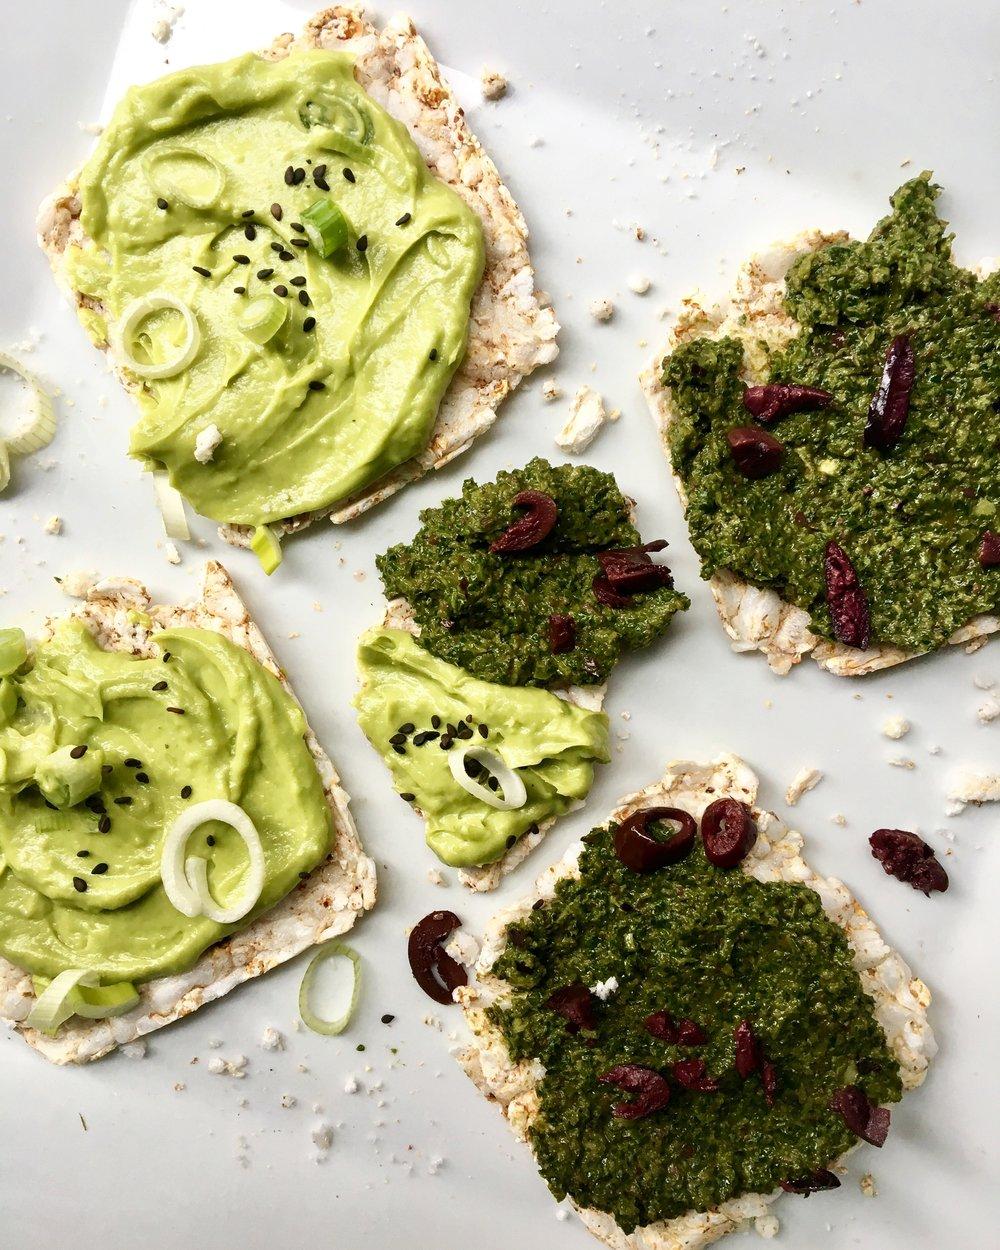 Miso Guac + Kale/Olive Tapenade Crisps